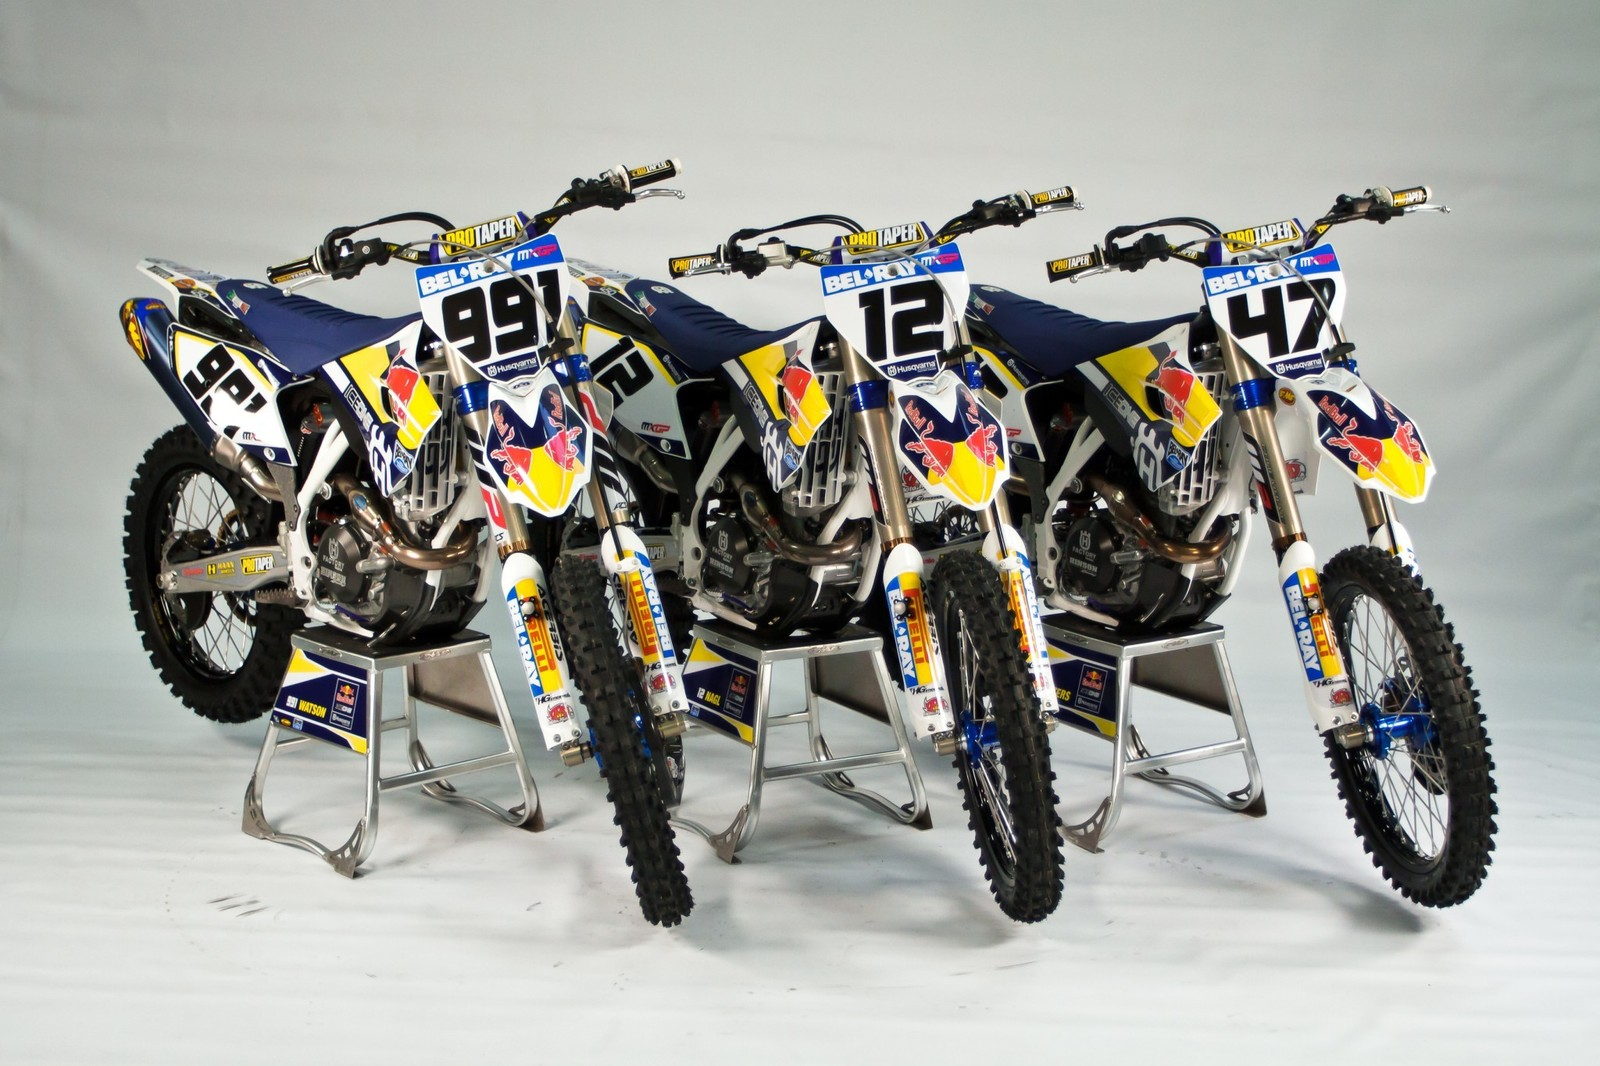 Blake Baggett Joins Yoshimura Suzuki For 2015 | Transworld Motocross